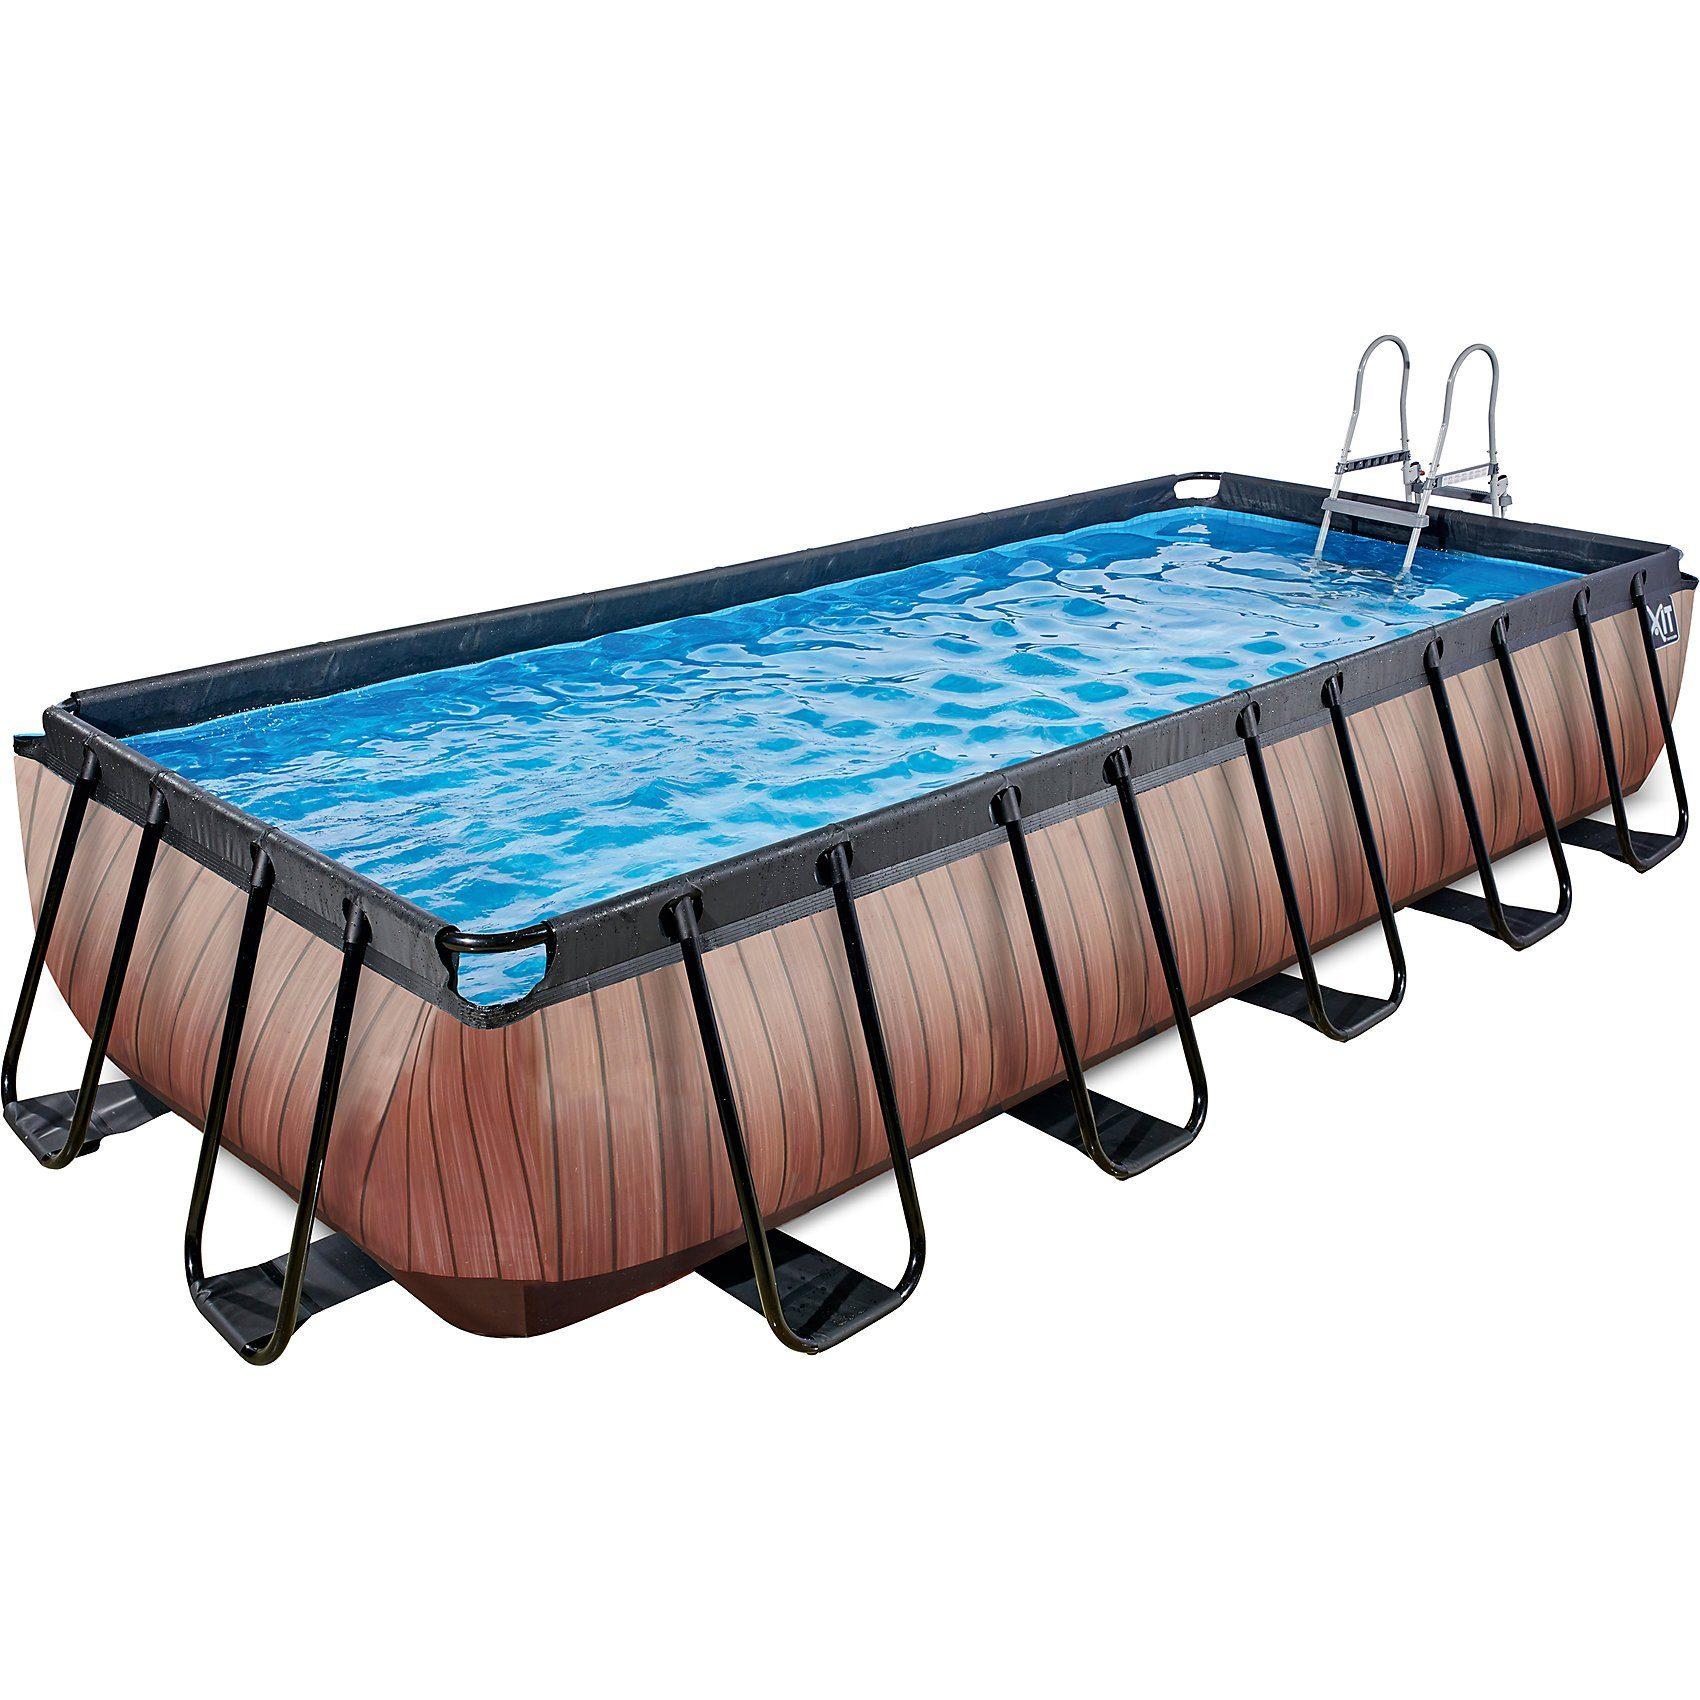 EXIT Frame Pool 5,4x2,5x1m Premium, Holz Optik